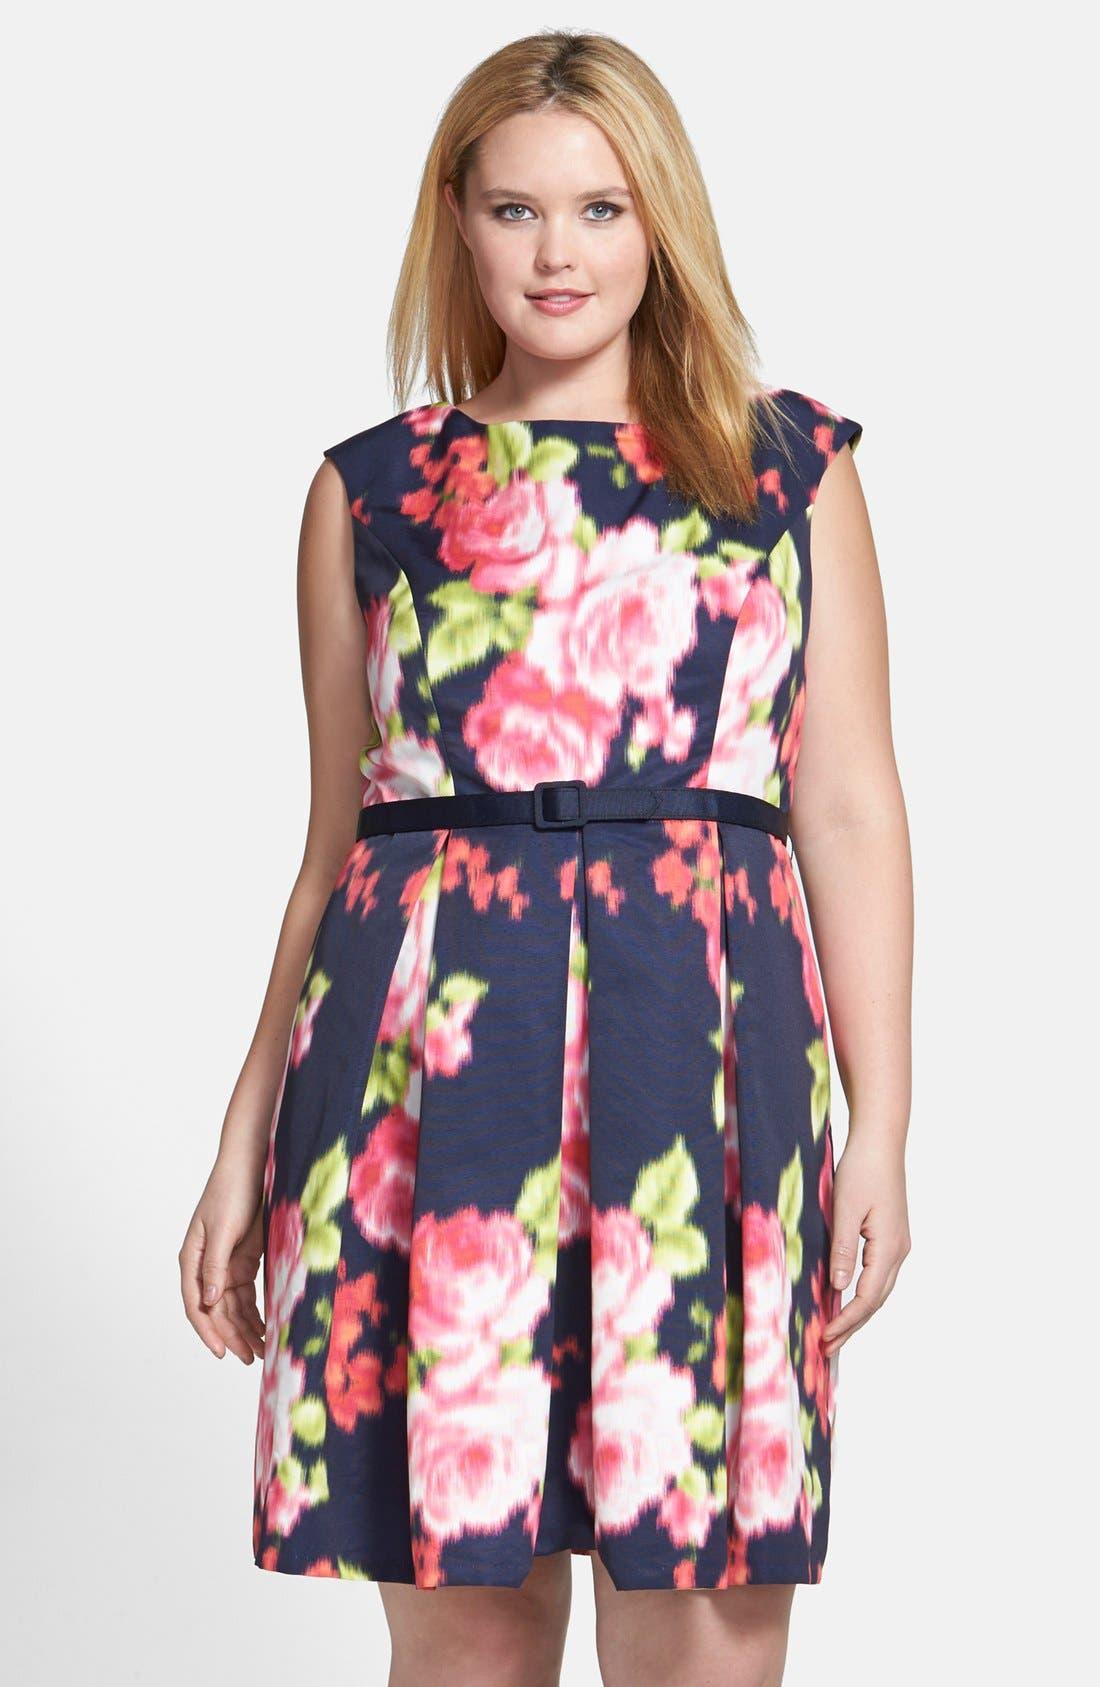 Alternate Image 1 Selected - Eliza J Floral Print Cap Sleeve Fit & Flare Dress (Plus Size)